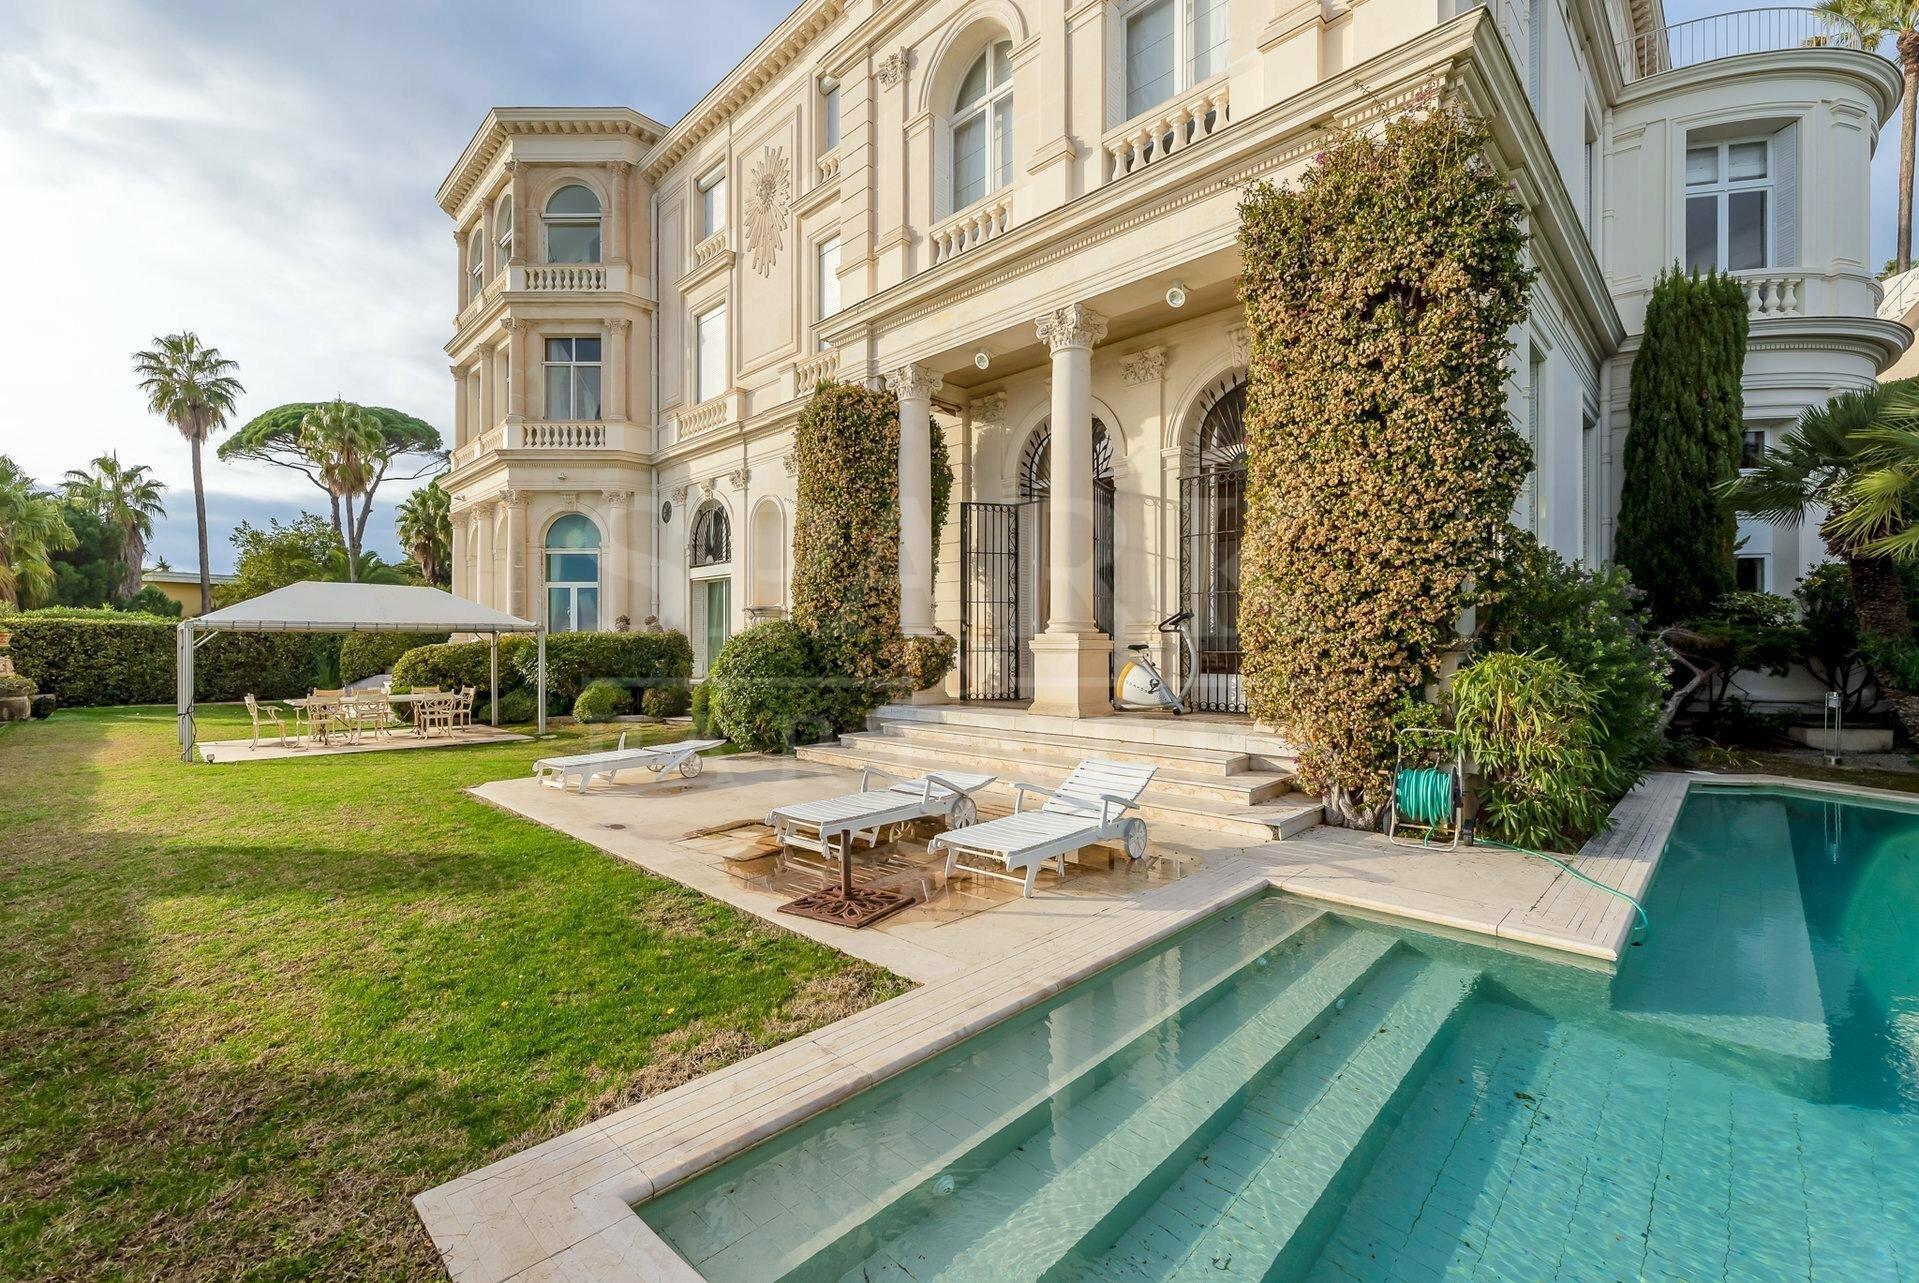 Apartment in Cannes, Provence-Alpes-Côte d'Azur, France 1 - 11255847